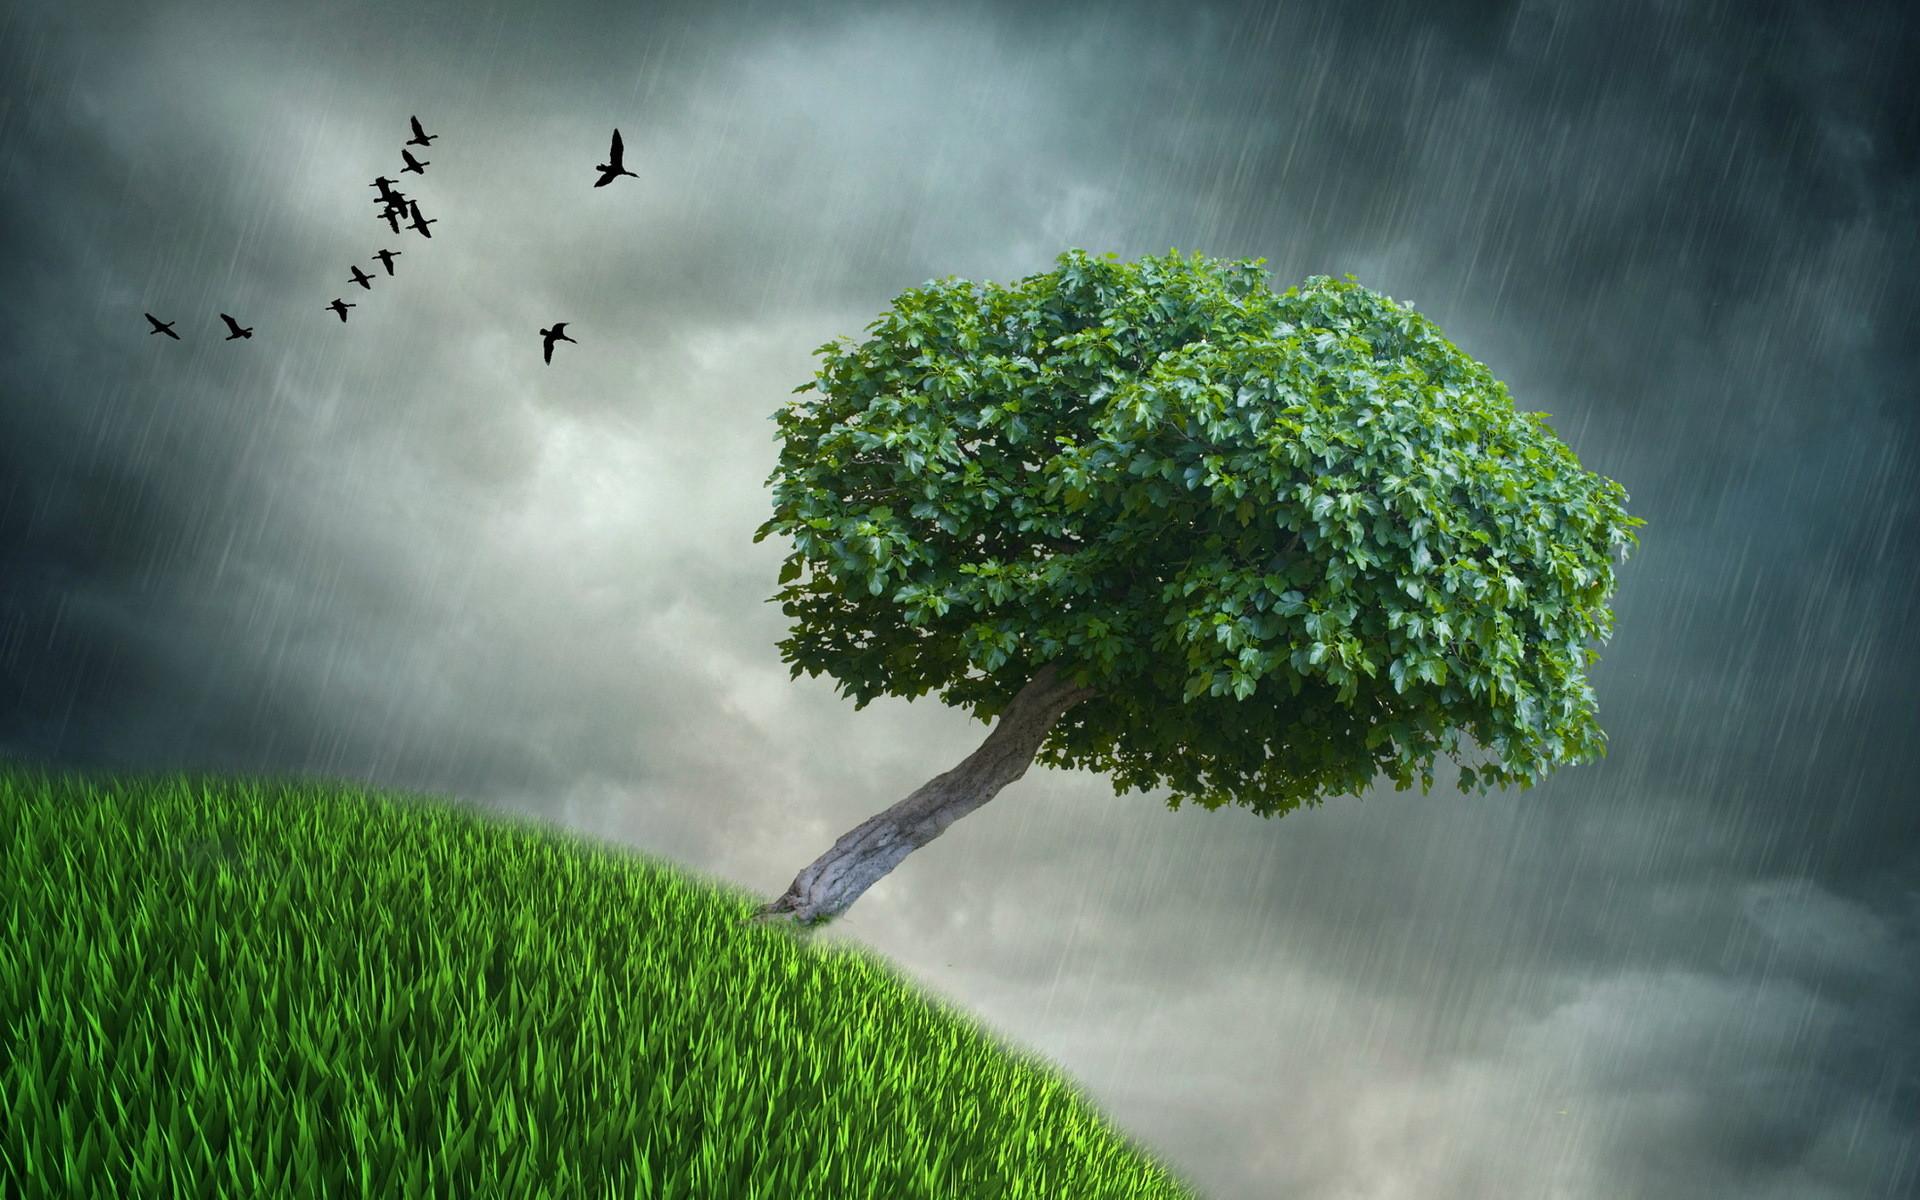 Rain storm desktop wallpaper 49 images for Rain wallpaper hd